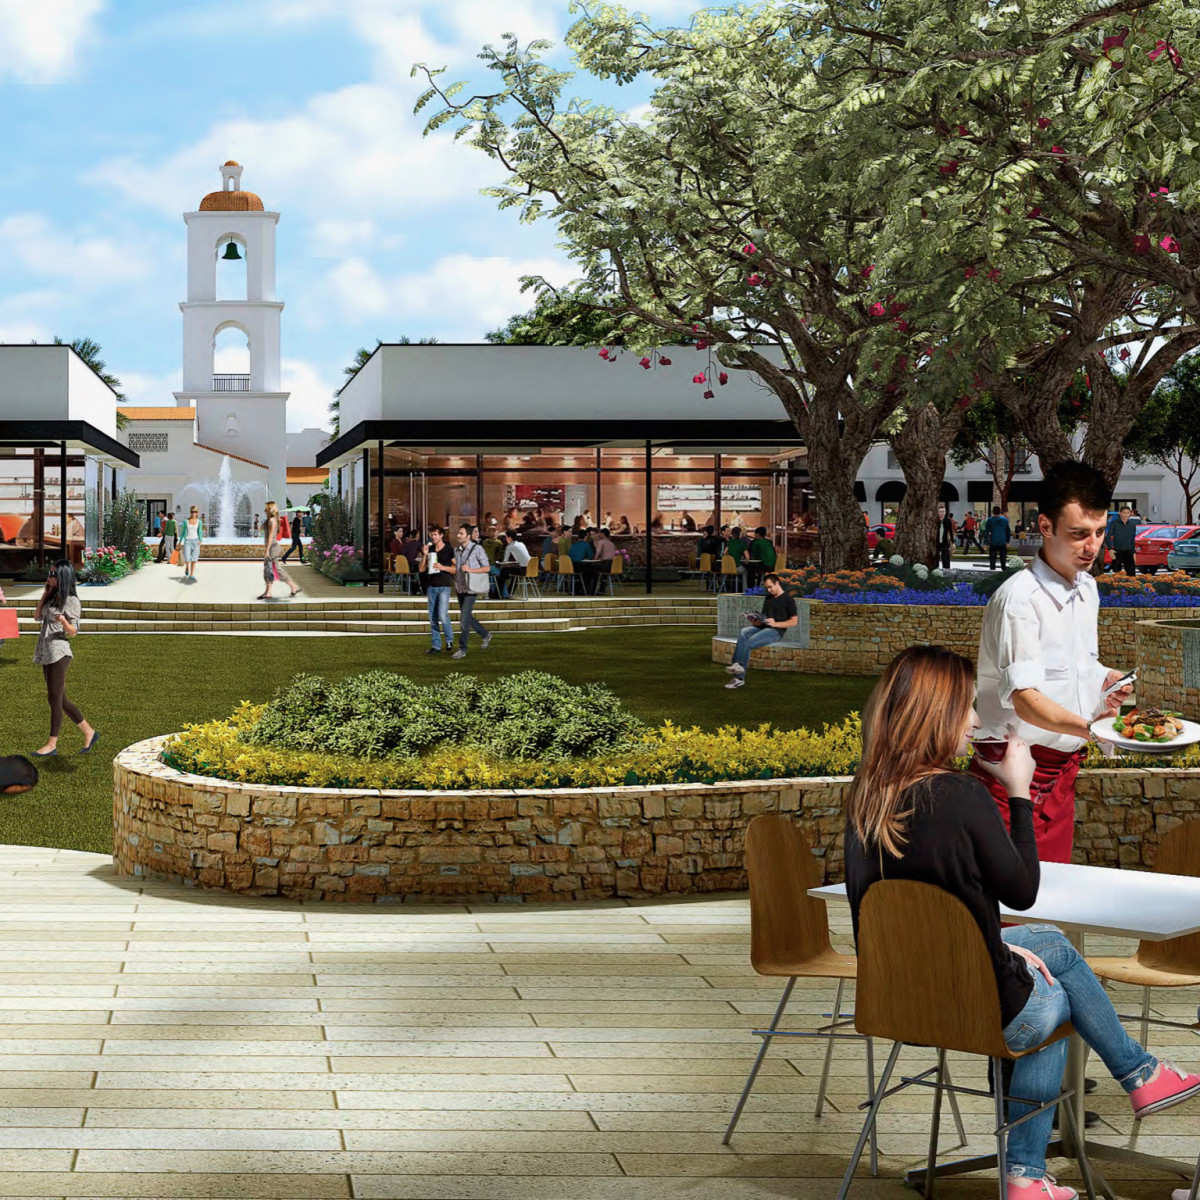 District West rendering